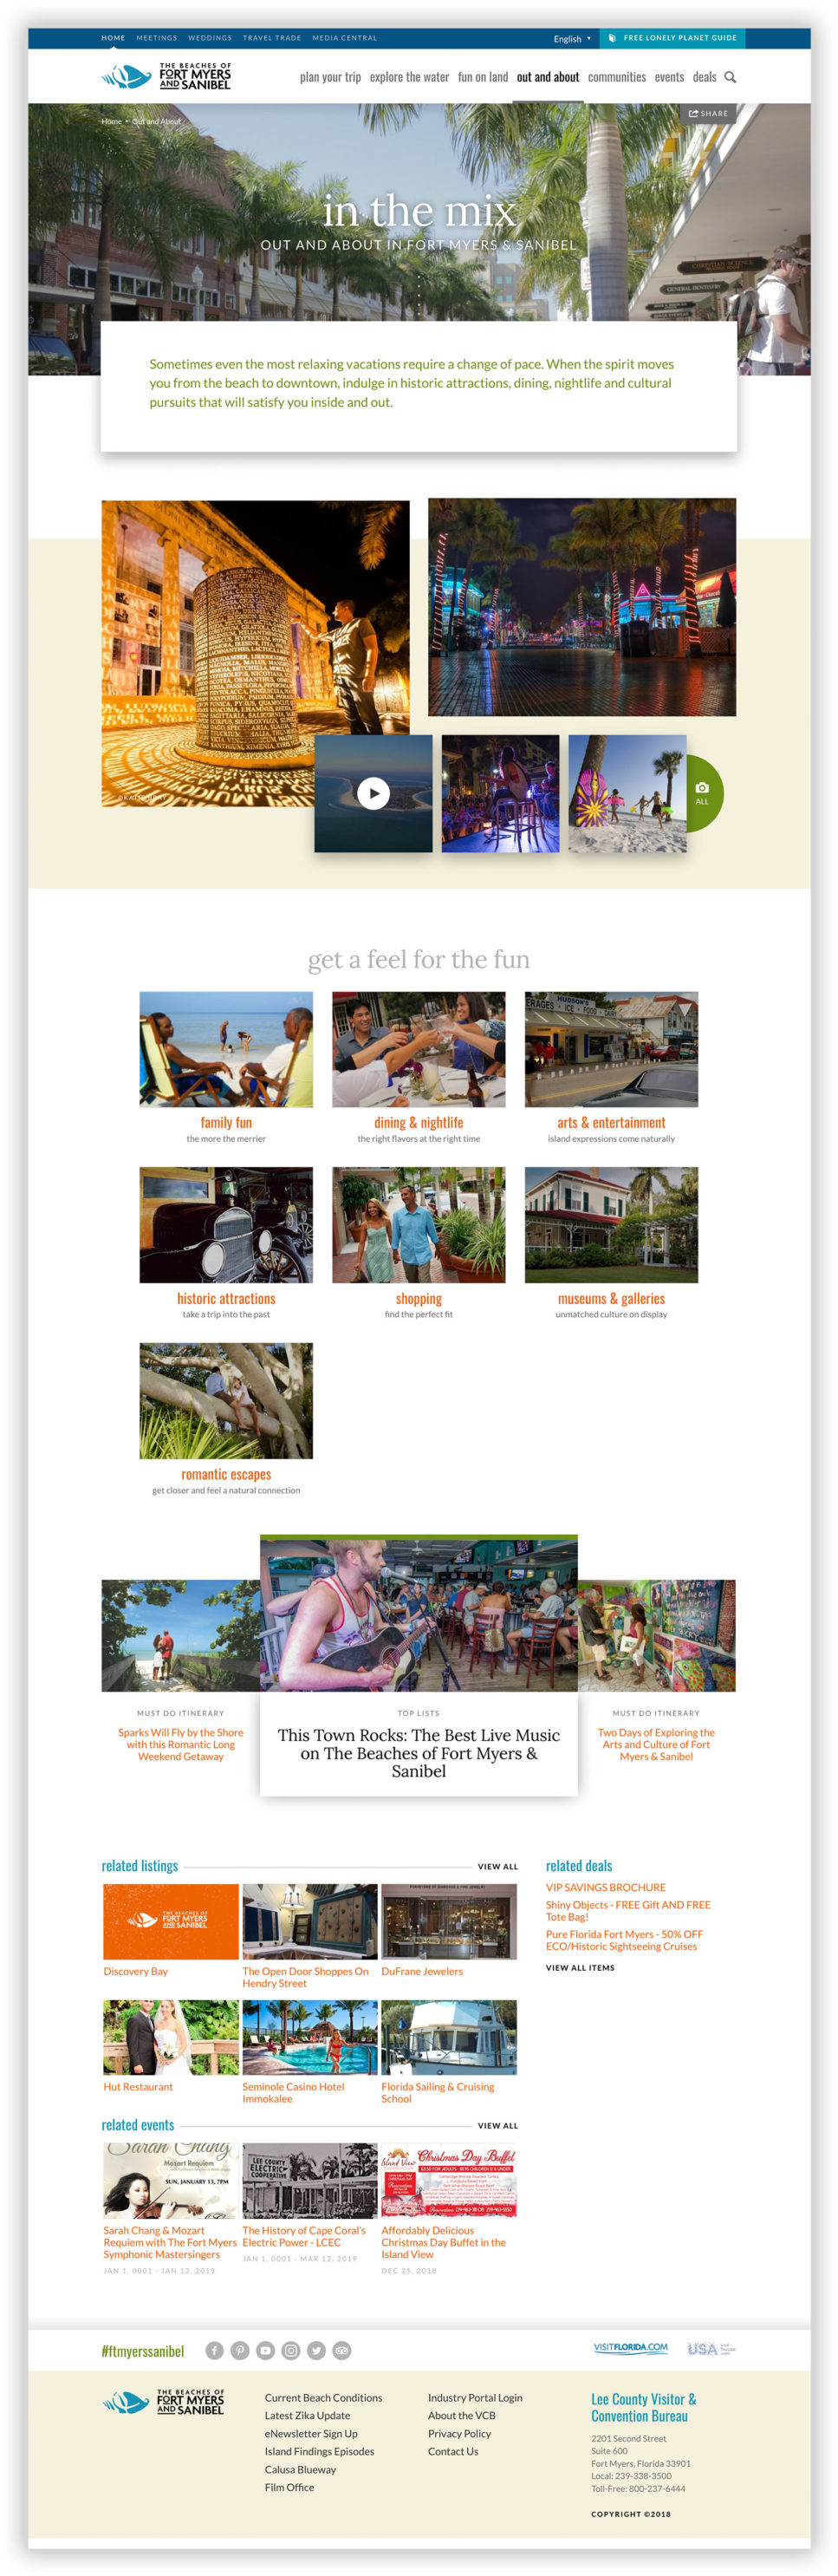 The Fort Myers/Sanibel neighborhood detail page